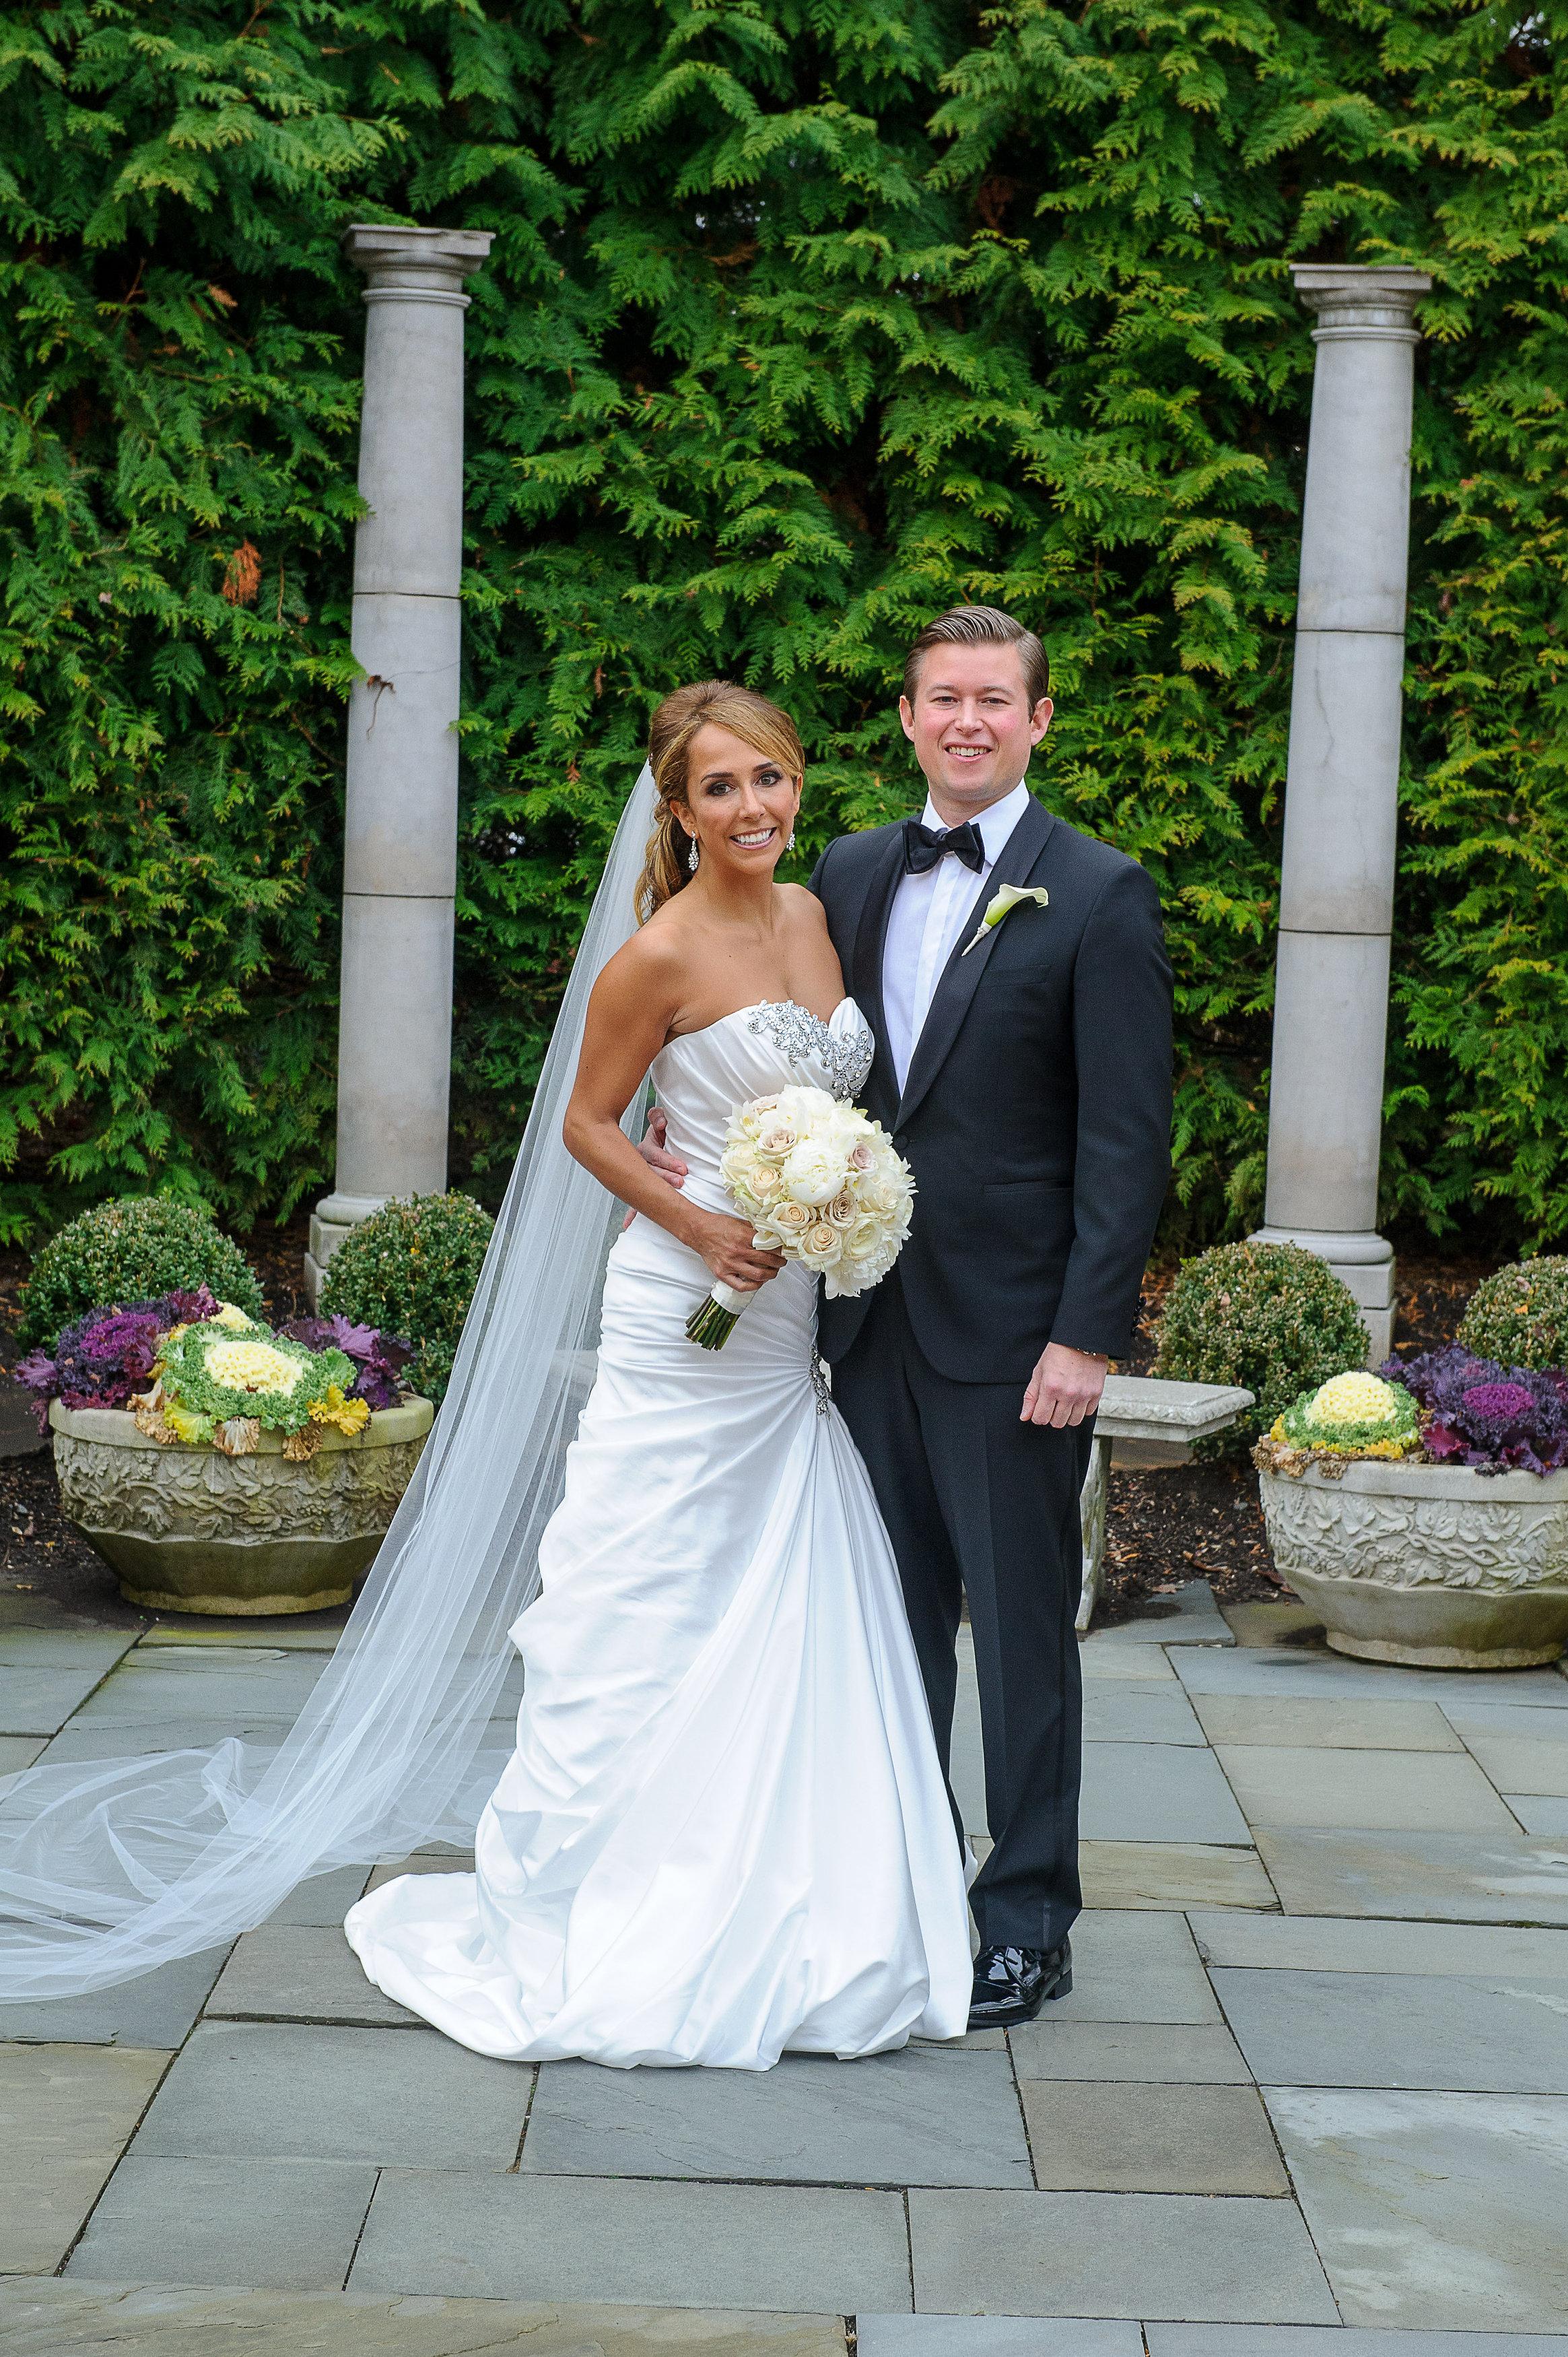 Ceci_New_York_Custom_Invitation_ New_Jersey_Wedding_Luxury_Personalized_Ceci_Style_Bride_Foil_Stamping94.JPG